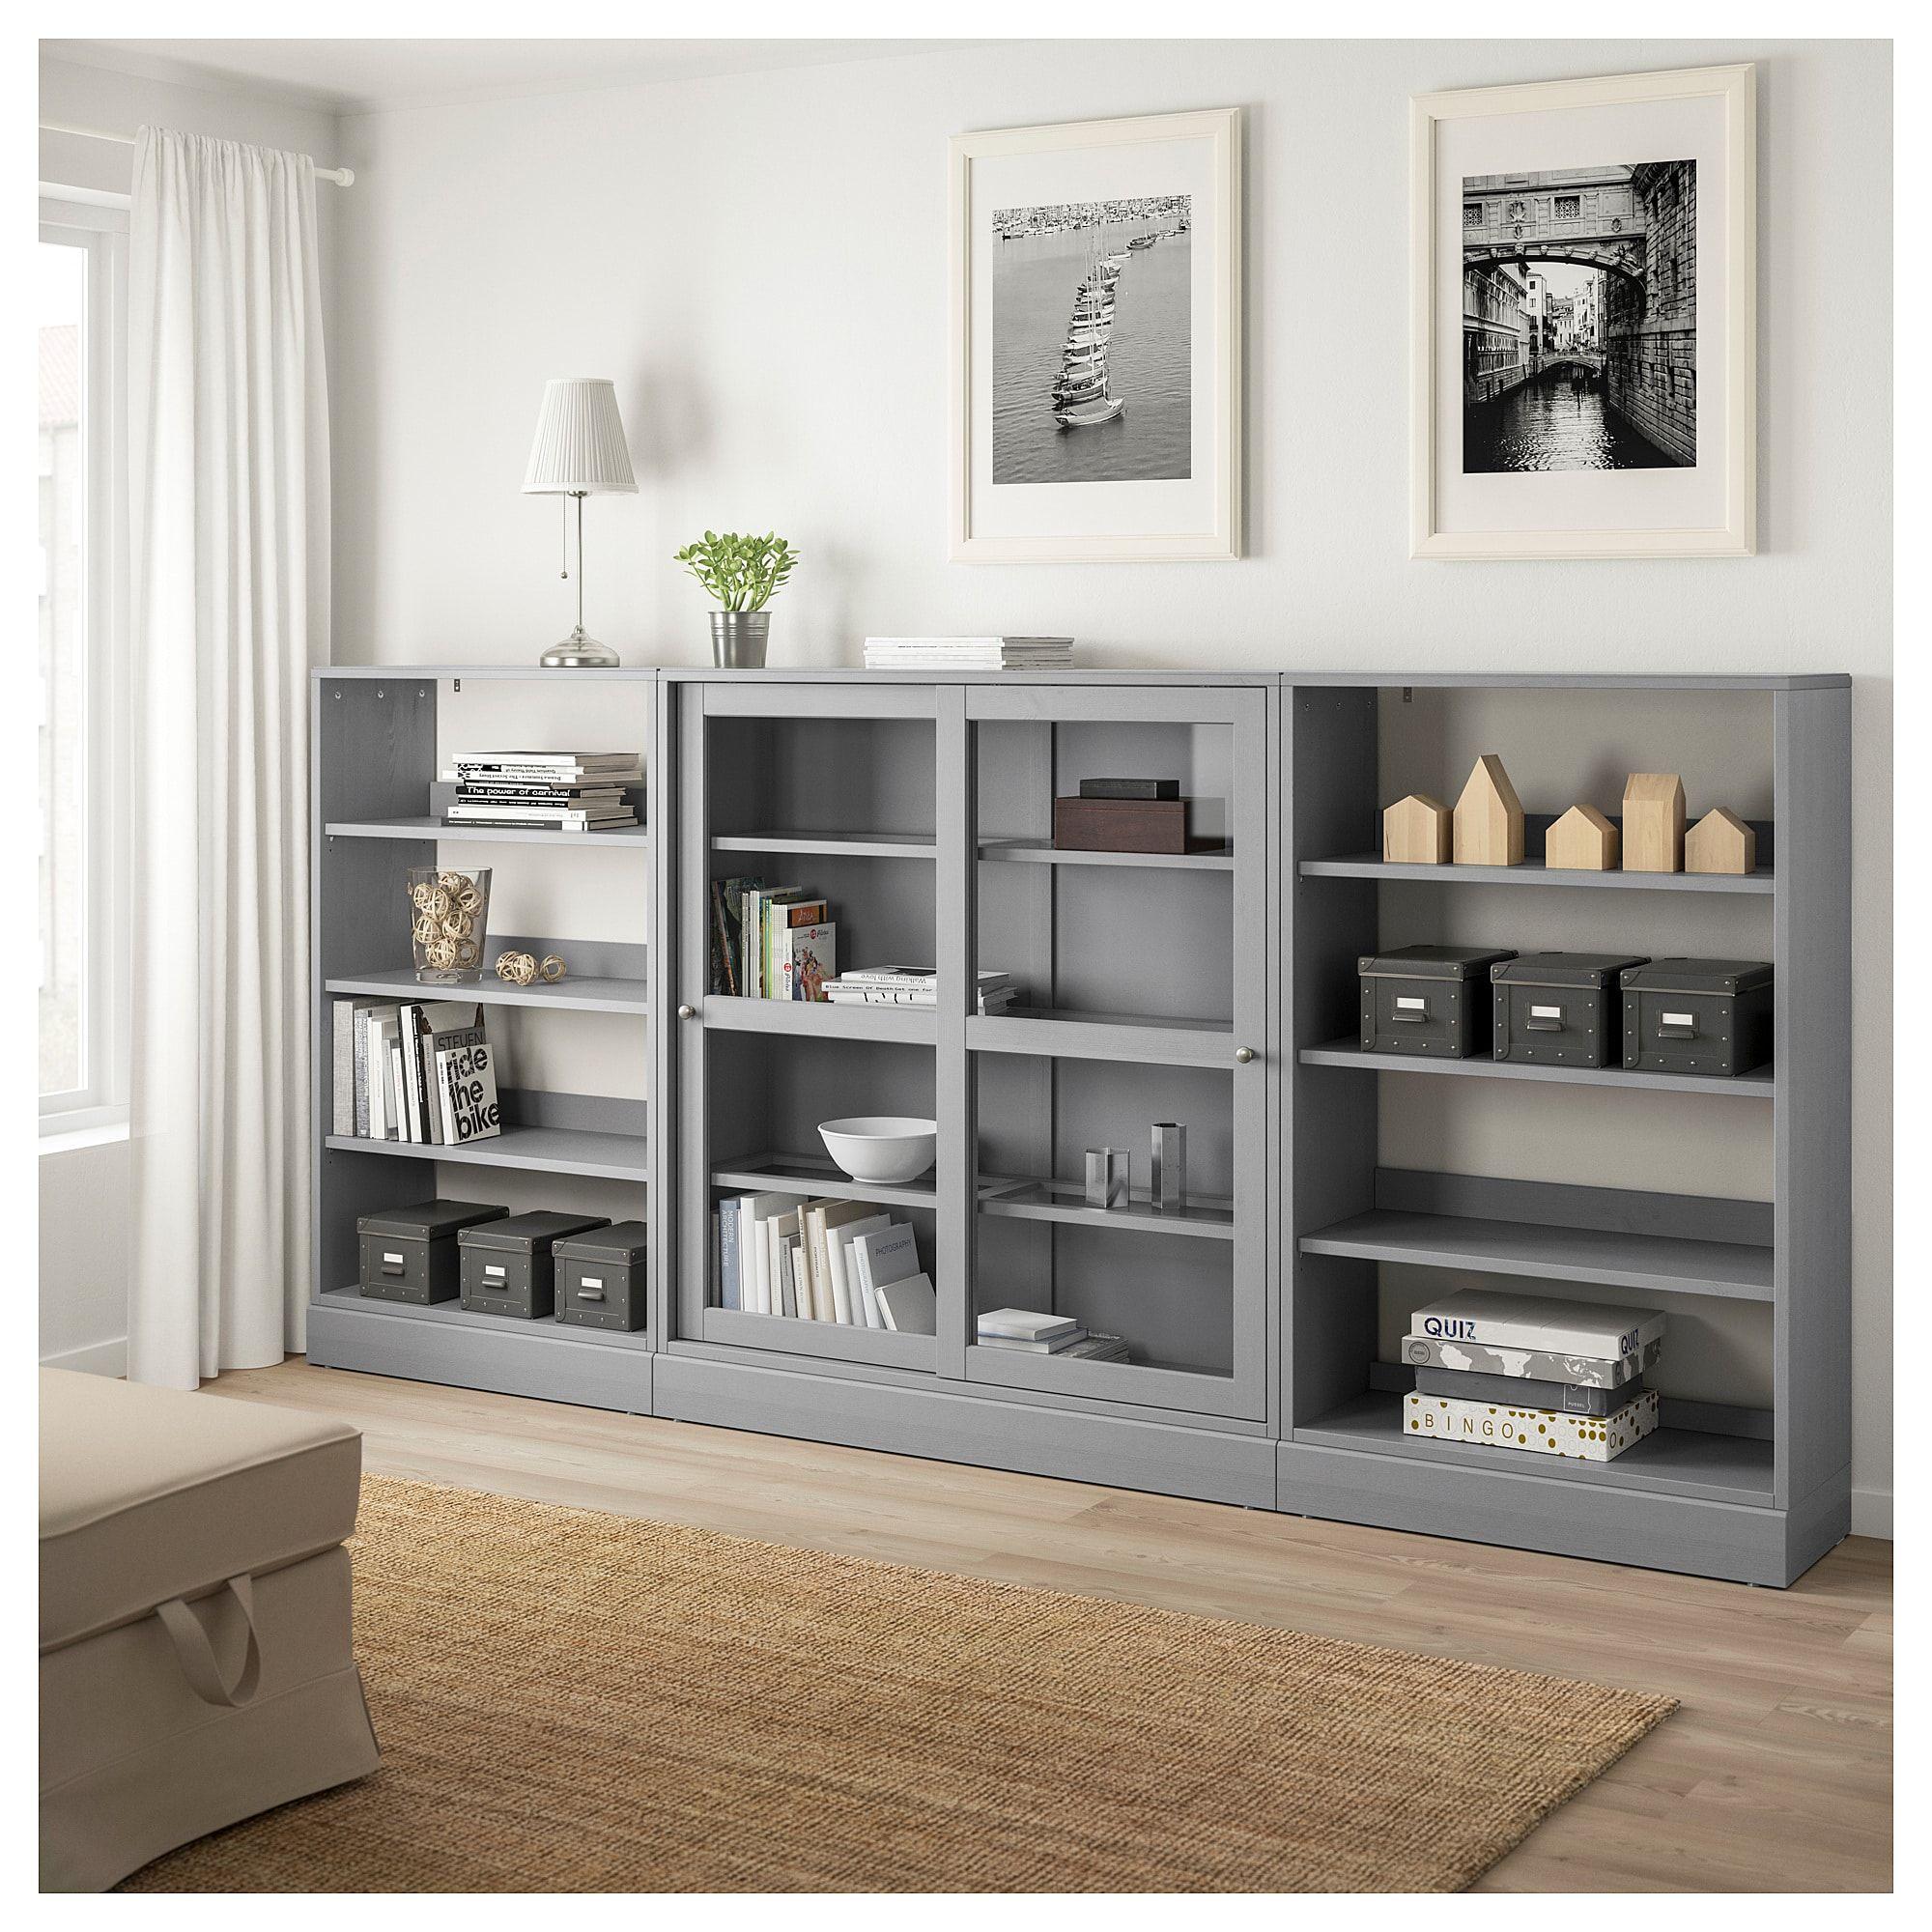 Ikea Havsta Storage With Sliding Glass Doors Gray In